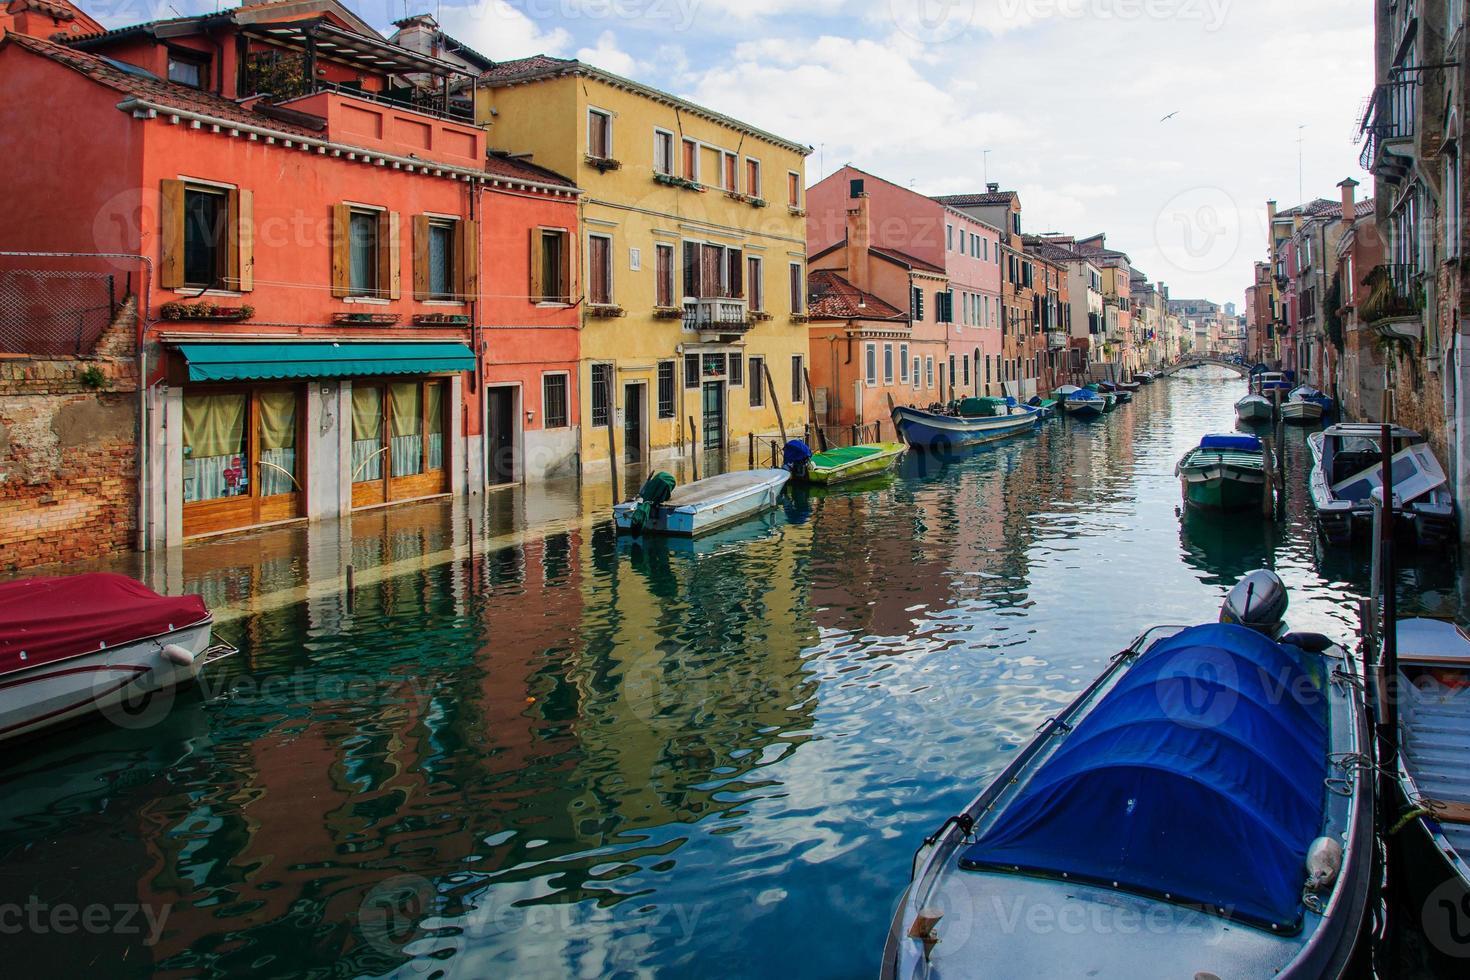 rue inondée, Venise photo